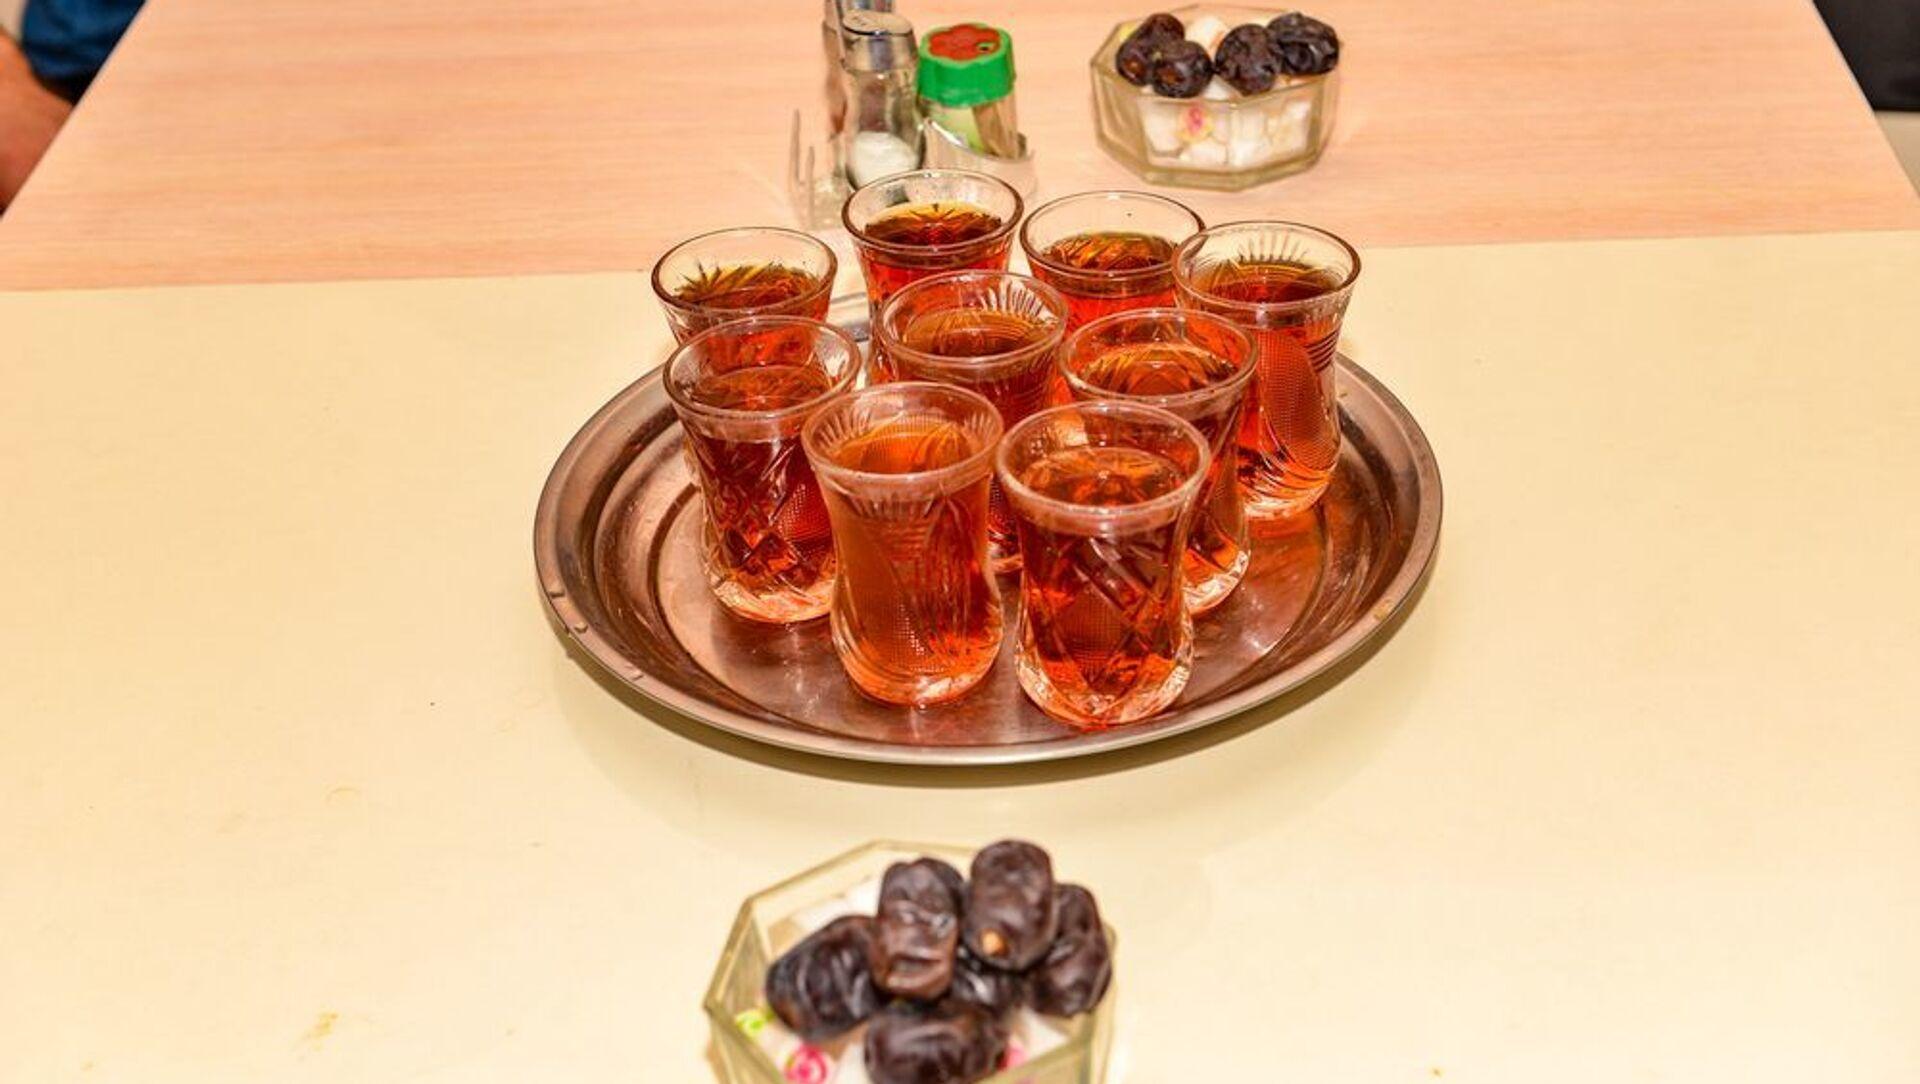 İftar süfrəsi - Sputnik Азербайджан, 1920, 12.04.2021